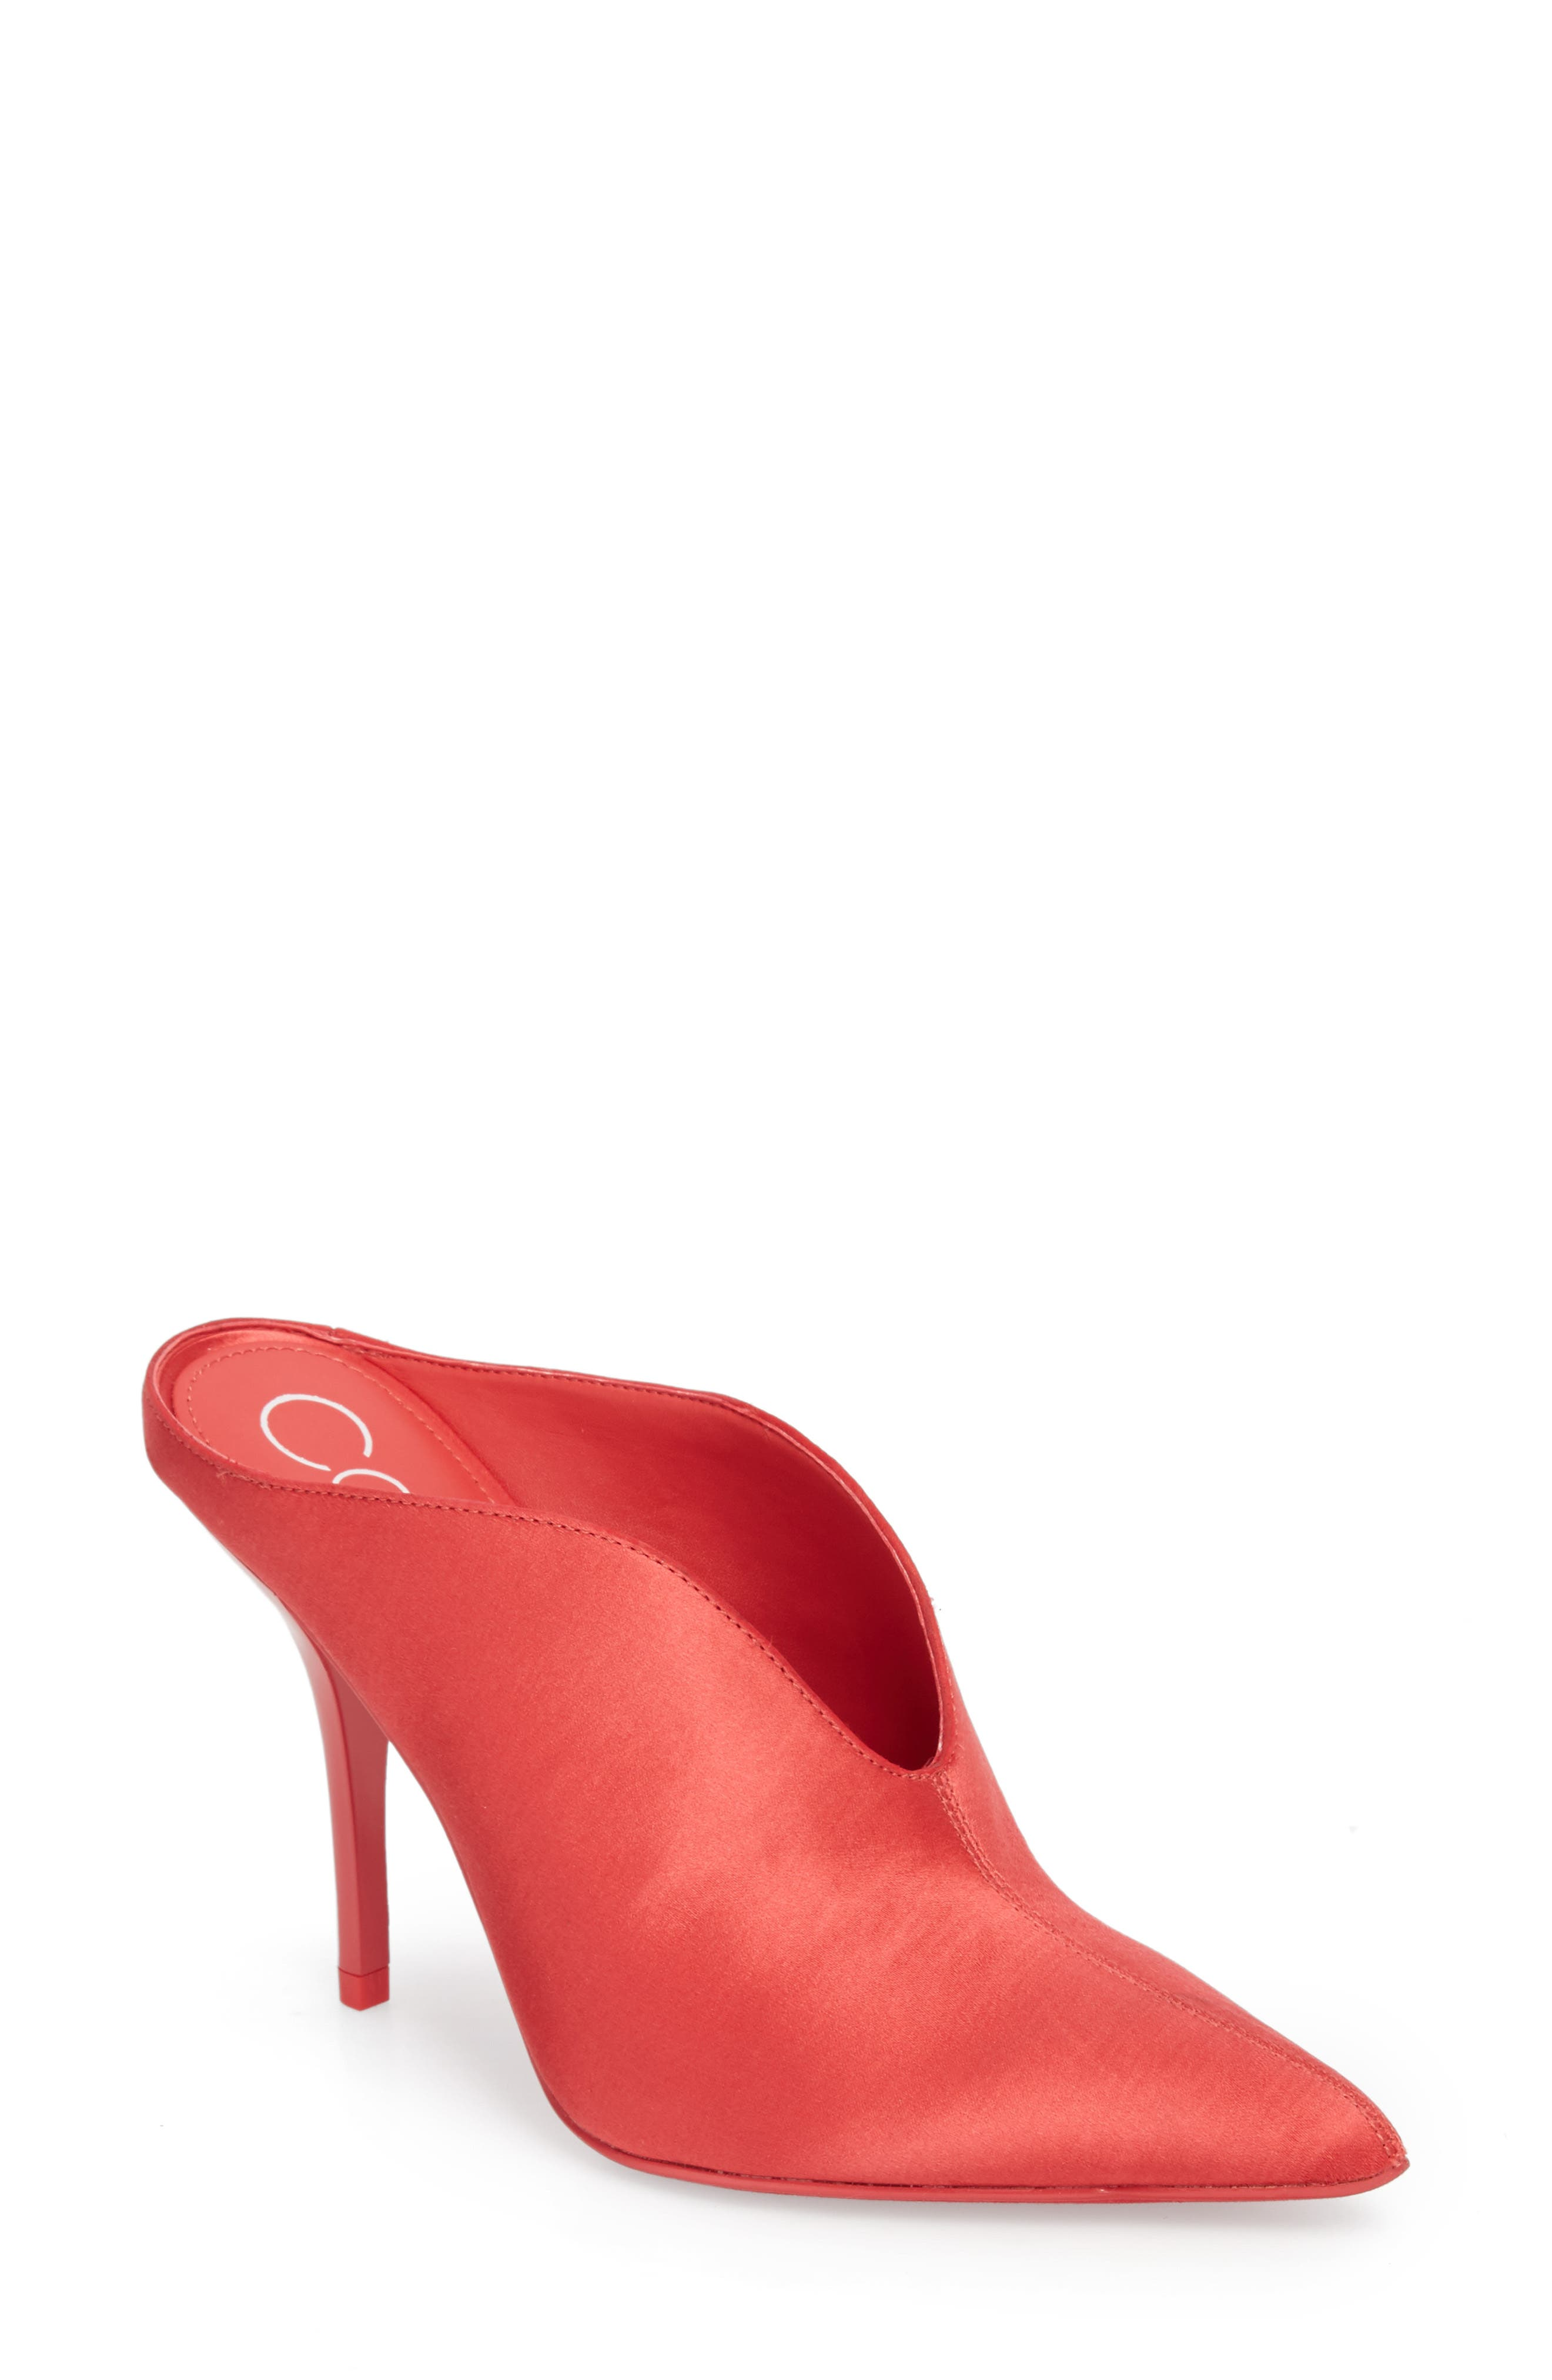 Mallie Pointy Toe Mule,                             Main thumbnail 1, color,                             Rose Quartz Fabric